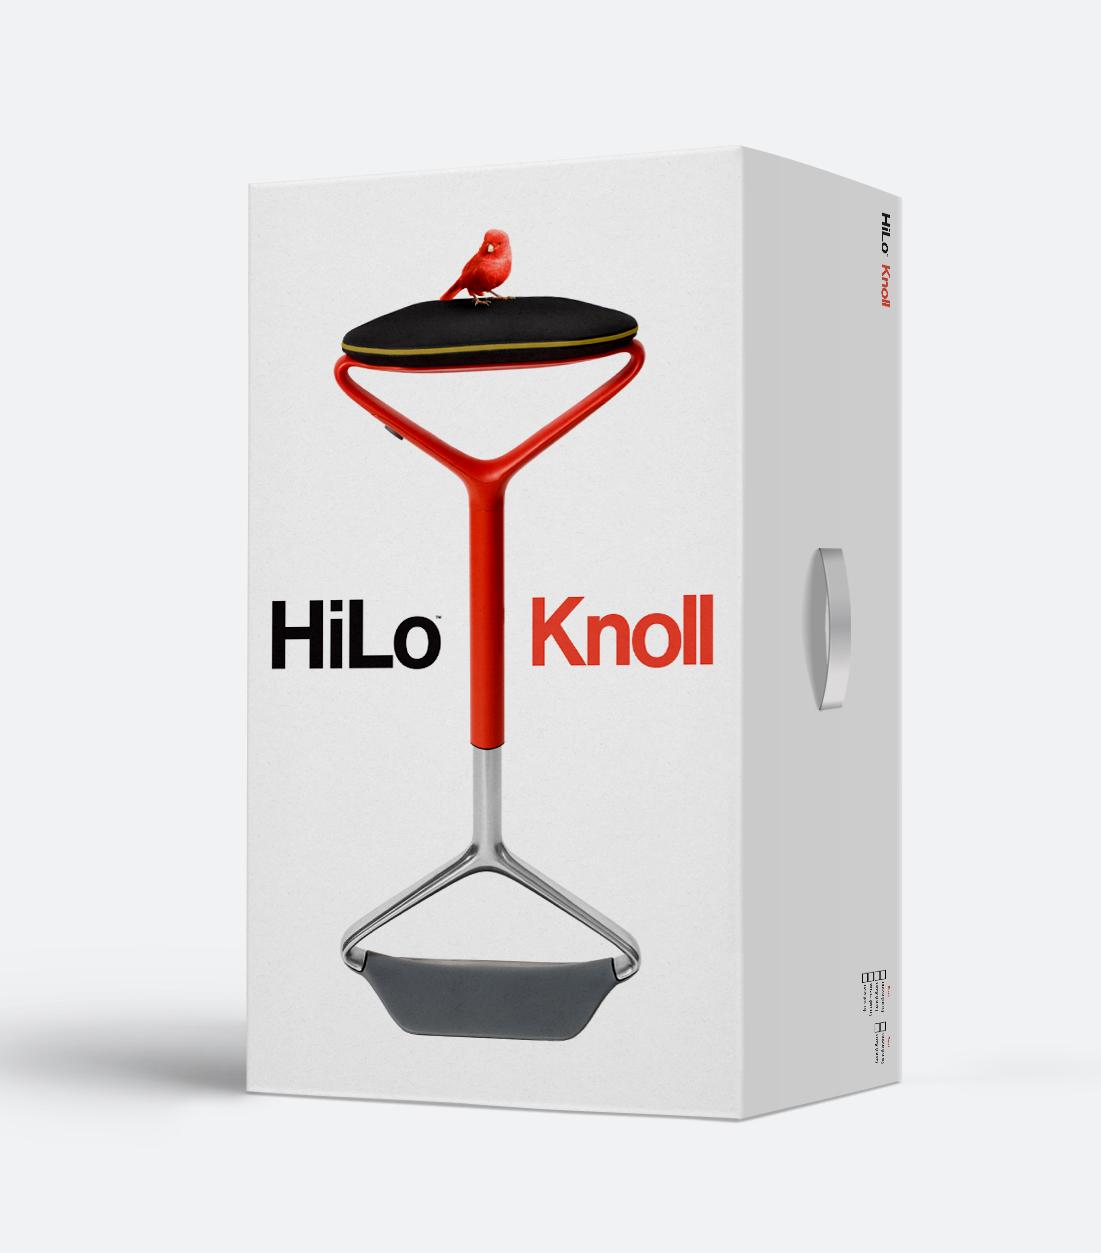 Knoll_HiLo_Work_01.jpg